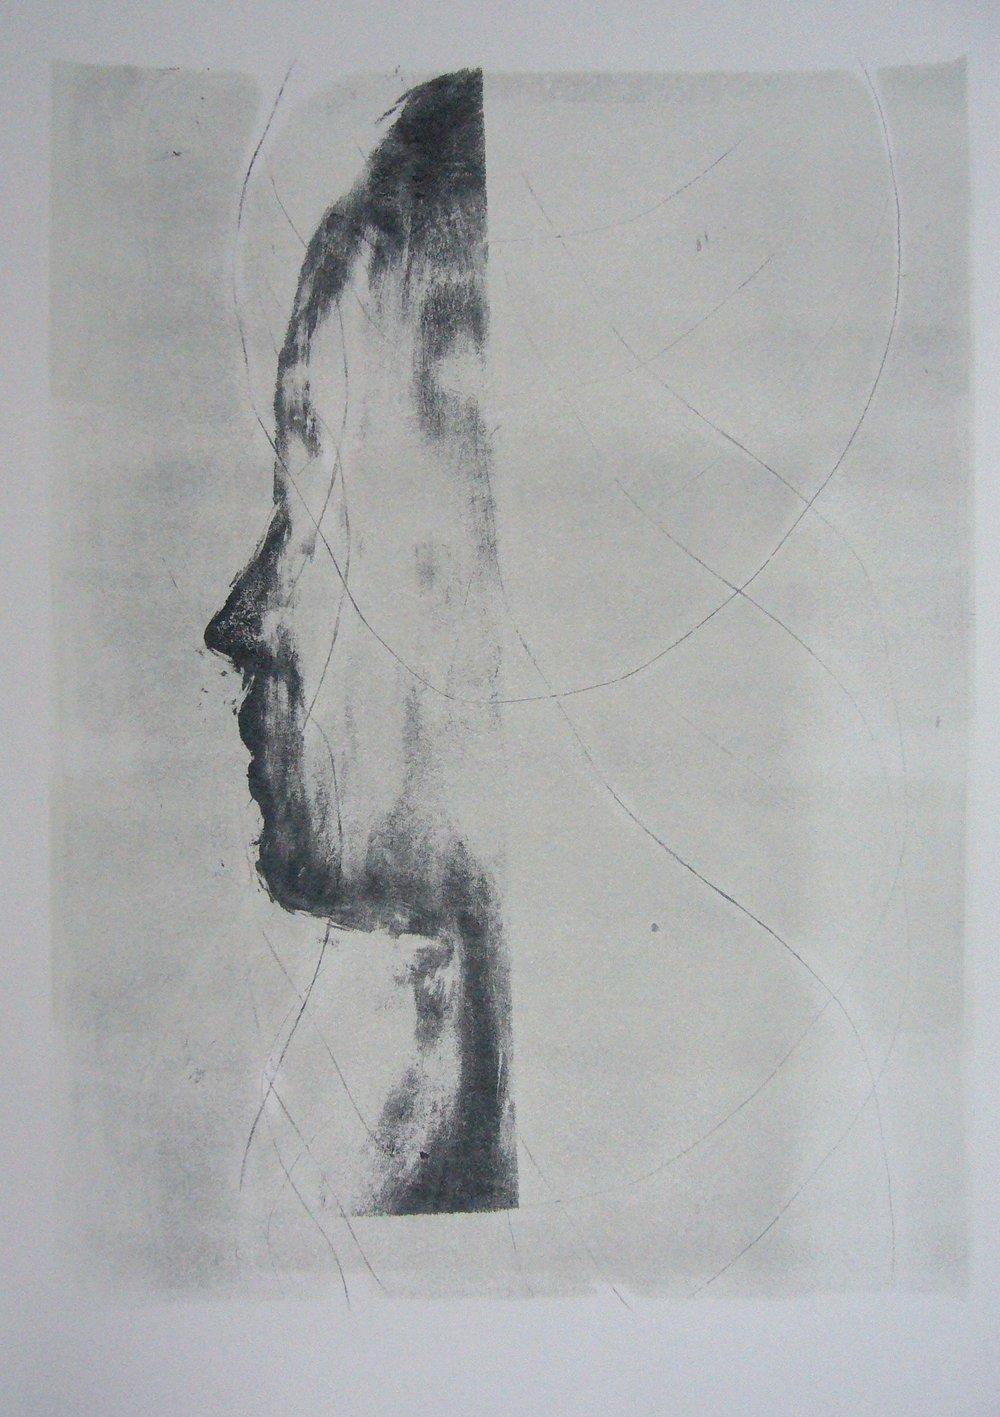 Kopf XII, e.e., 2014, 59 cm x 42 cm.JPG